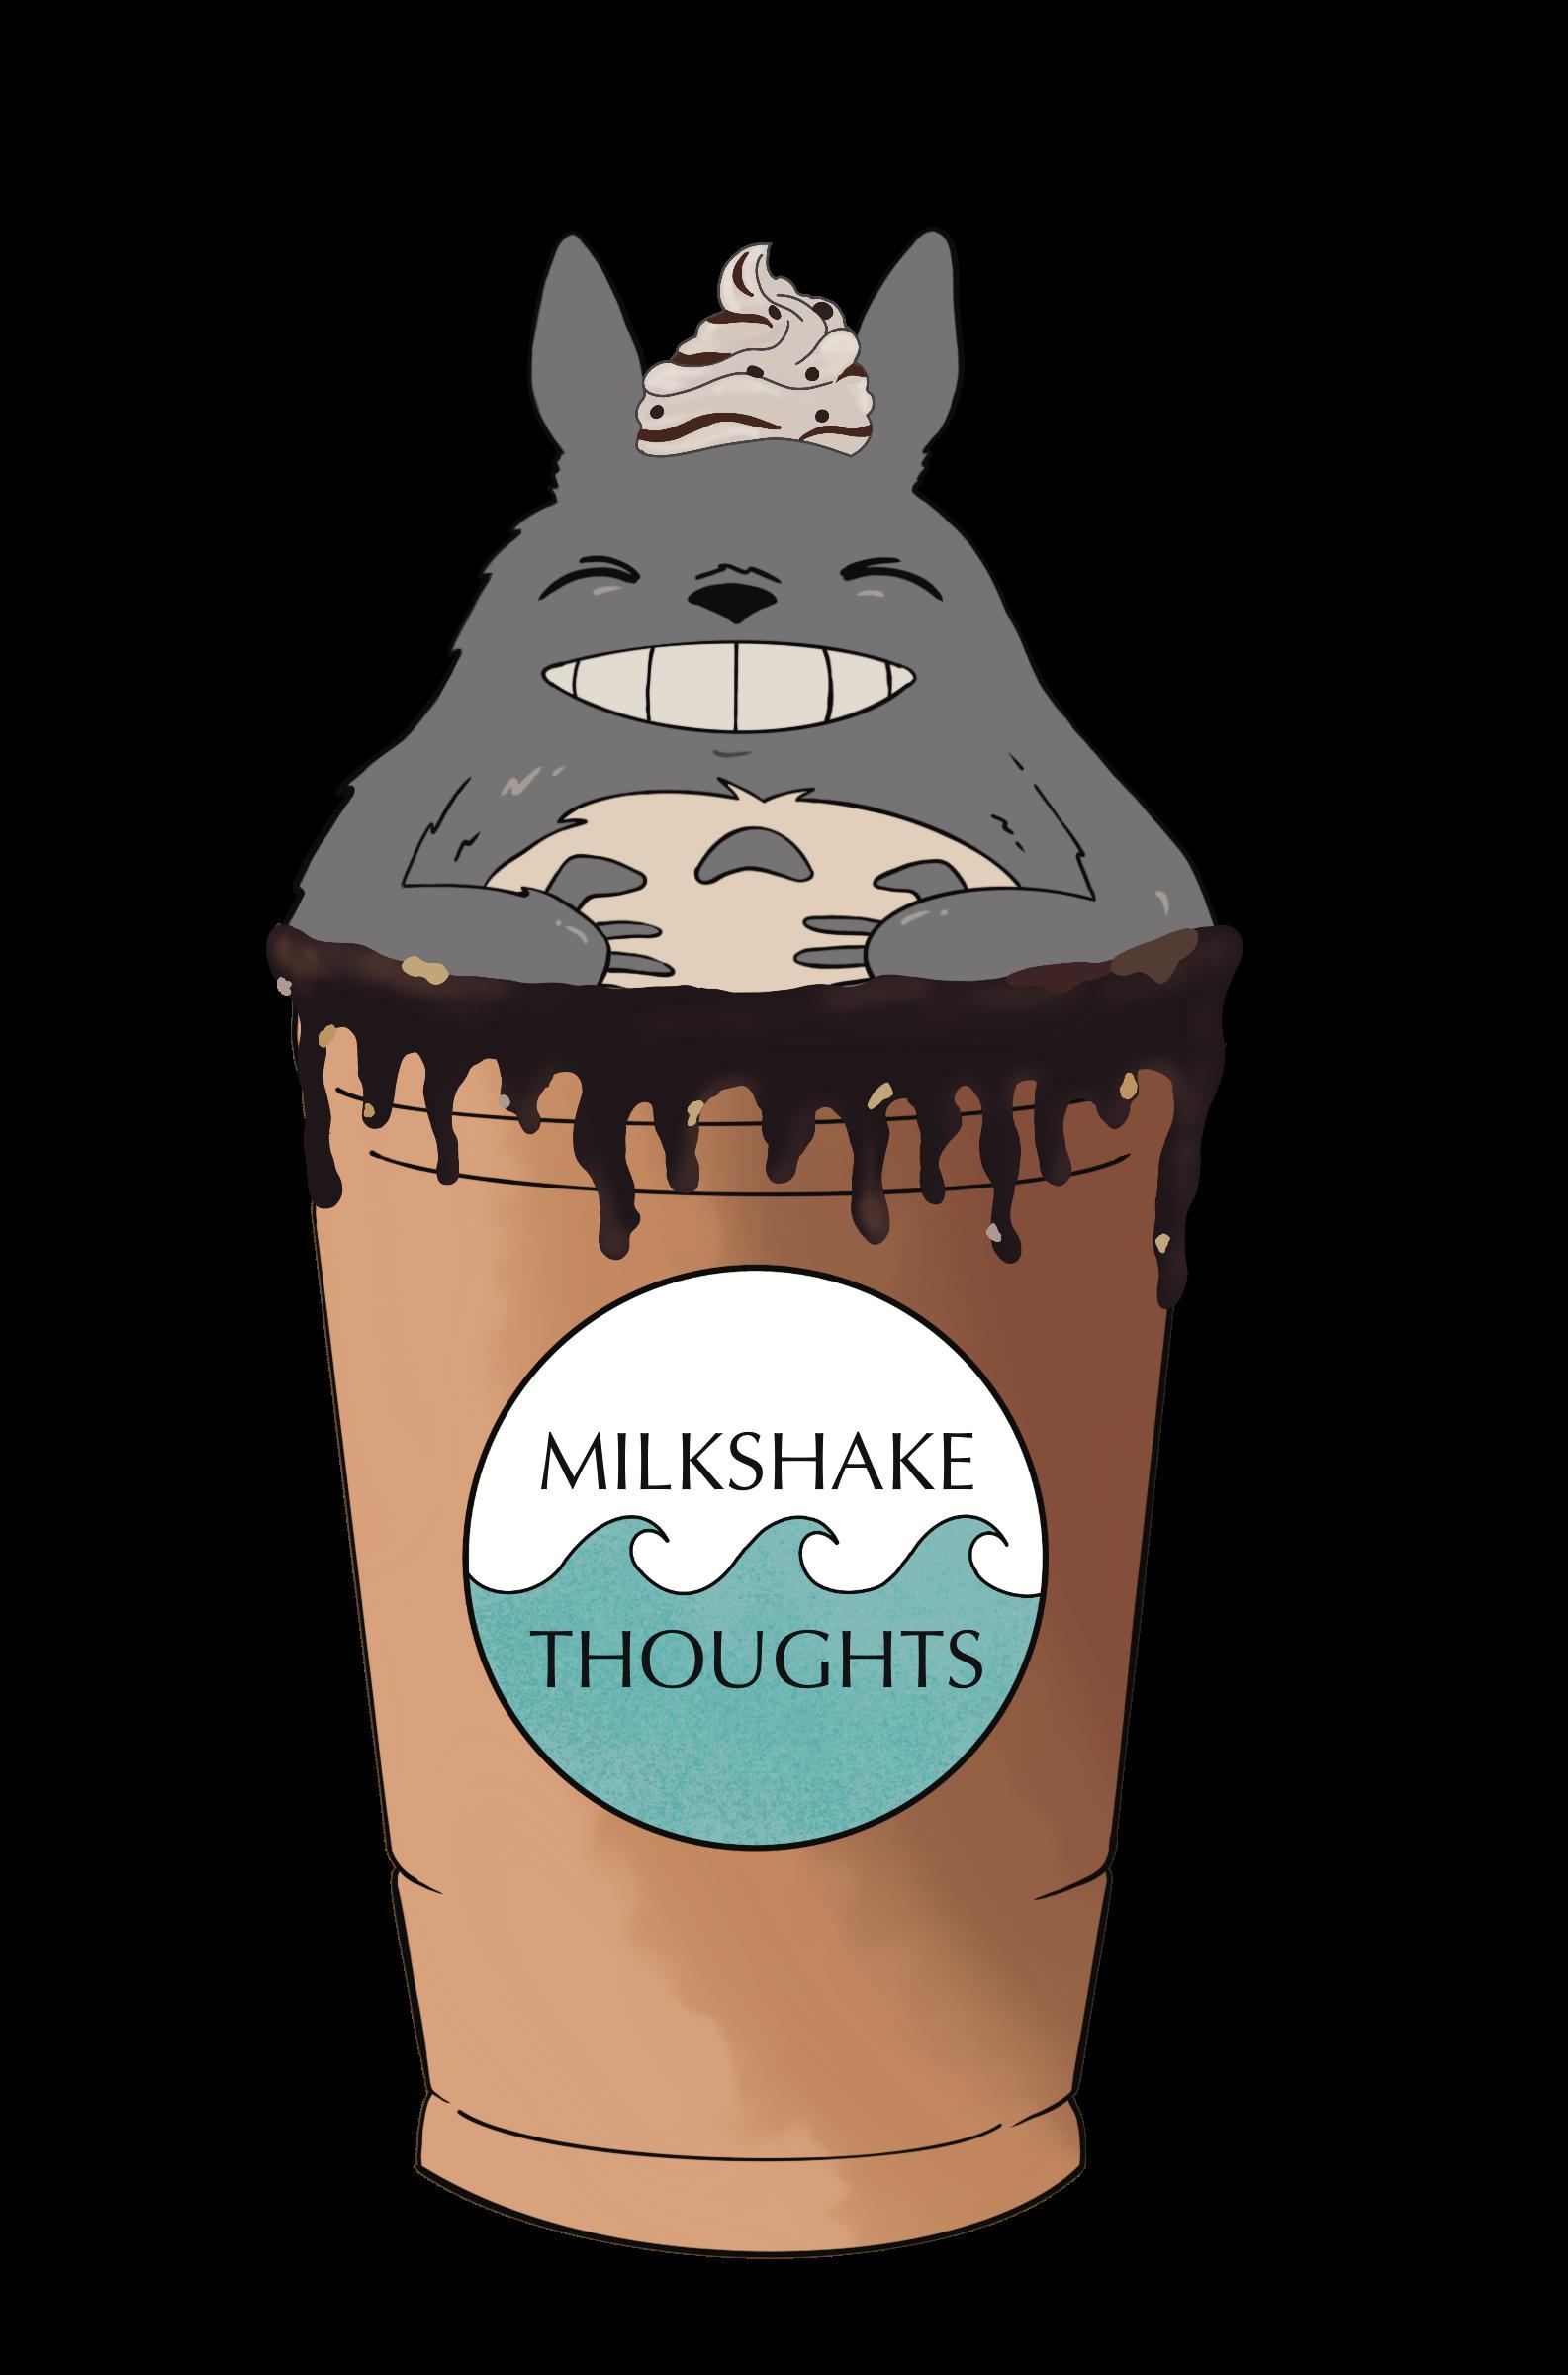 Milkshake Thoughts